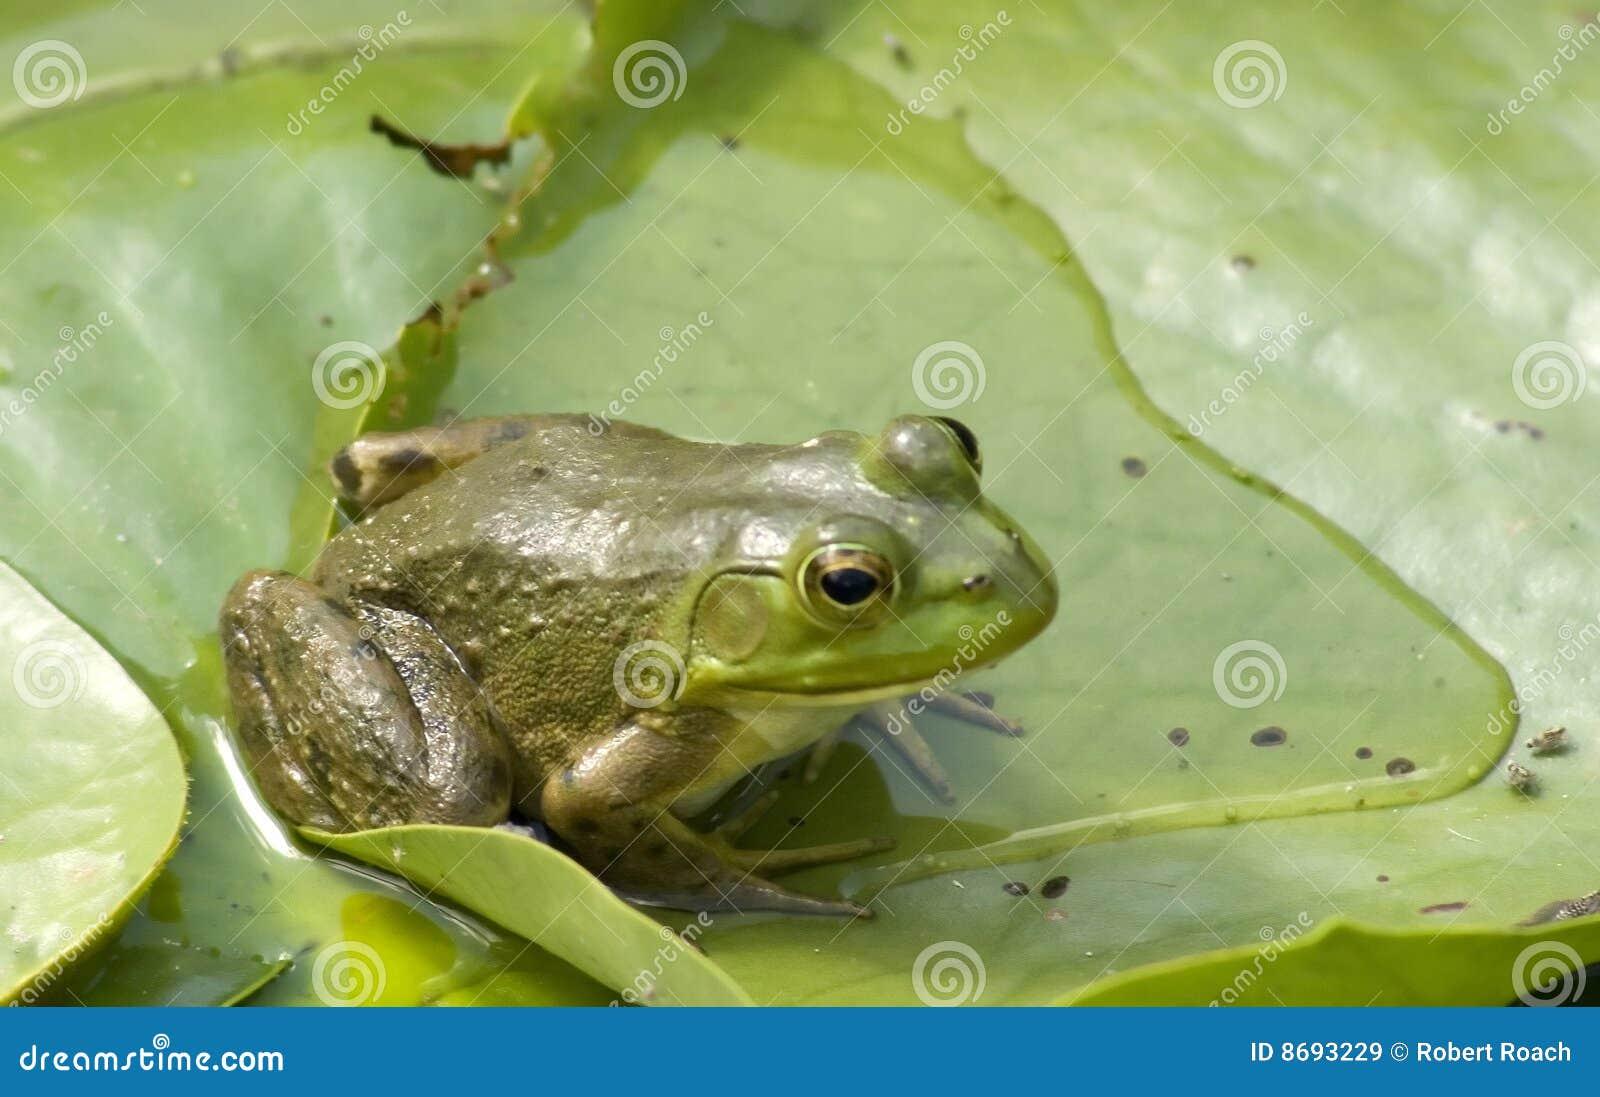 Auffallender grüner Frosch